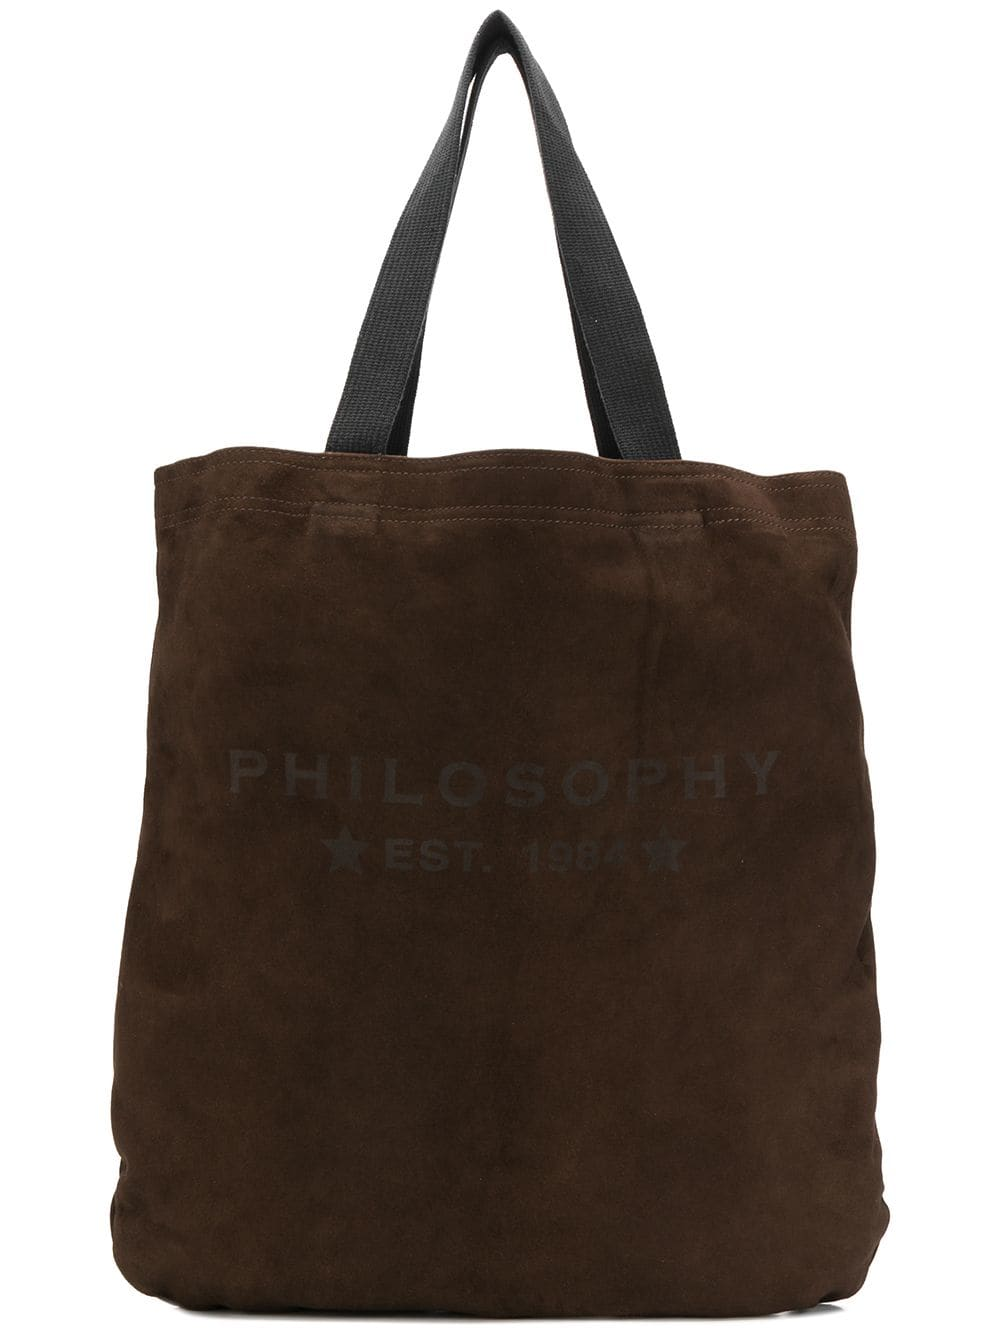 Philosophy Di Lorenzo Serafini Handtasche mit Logo - Braun